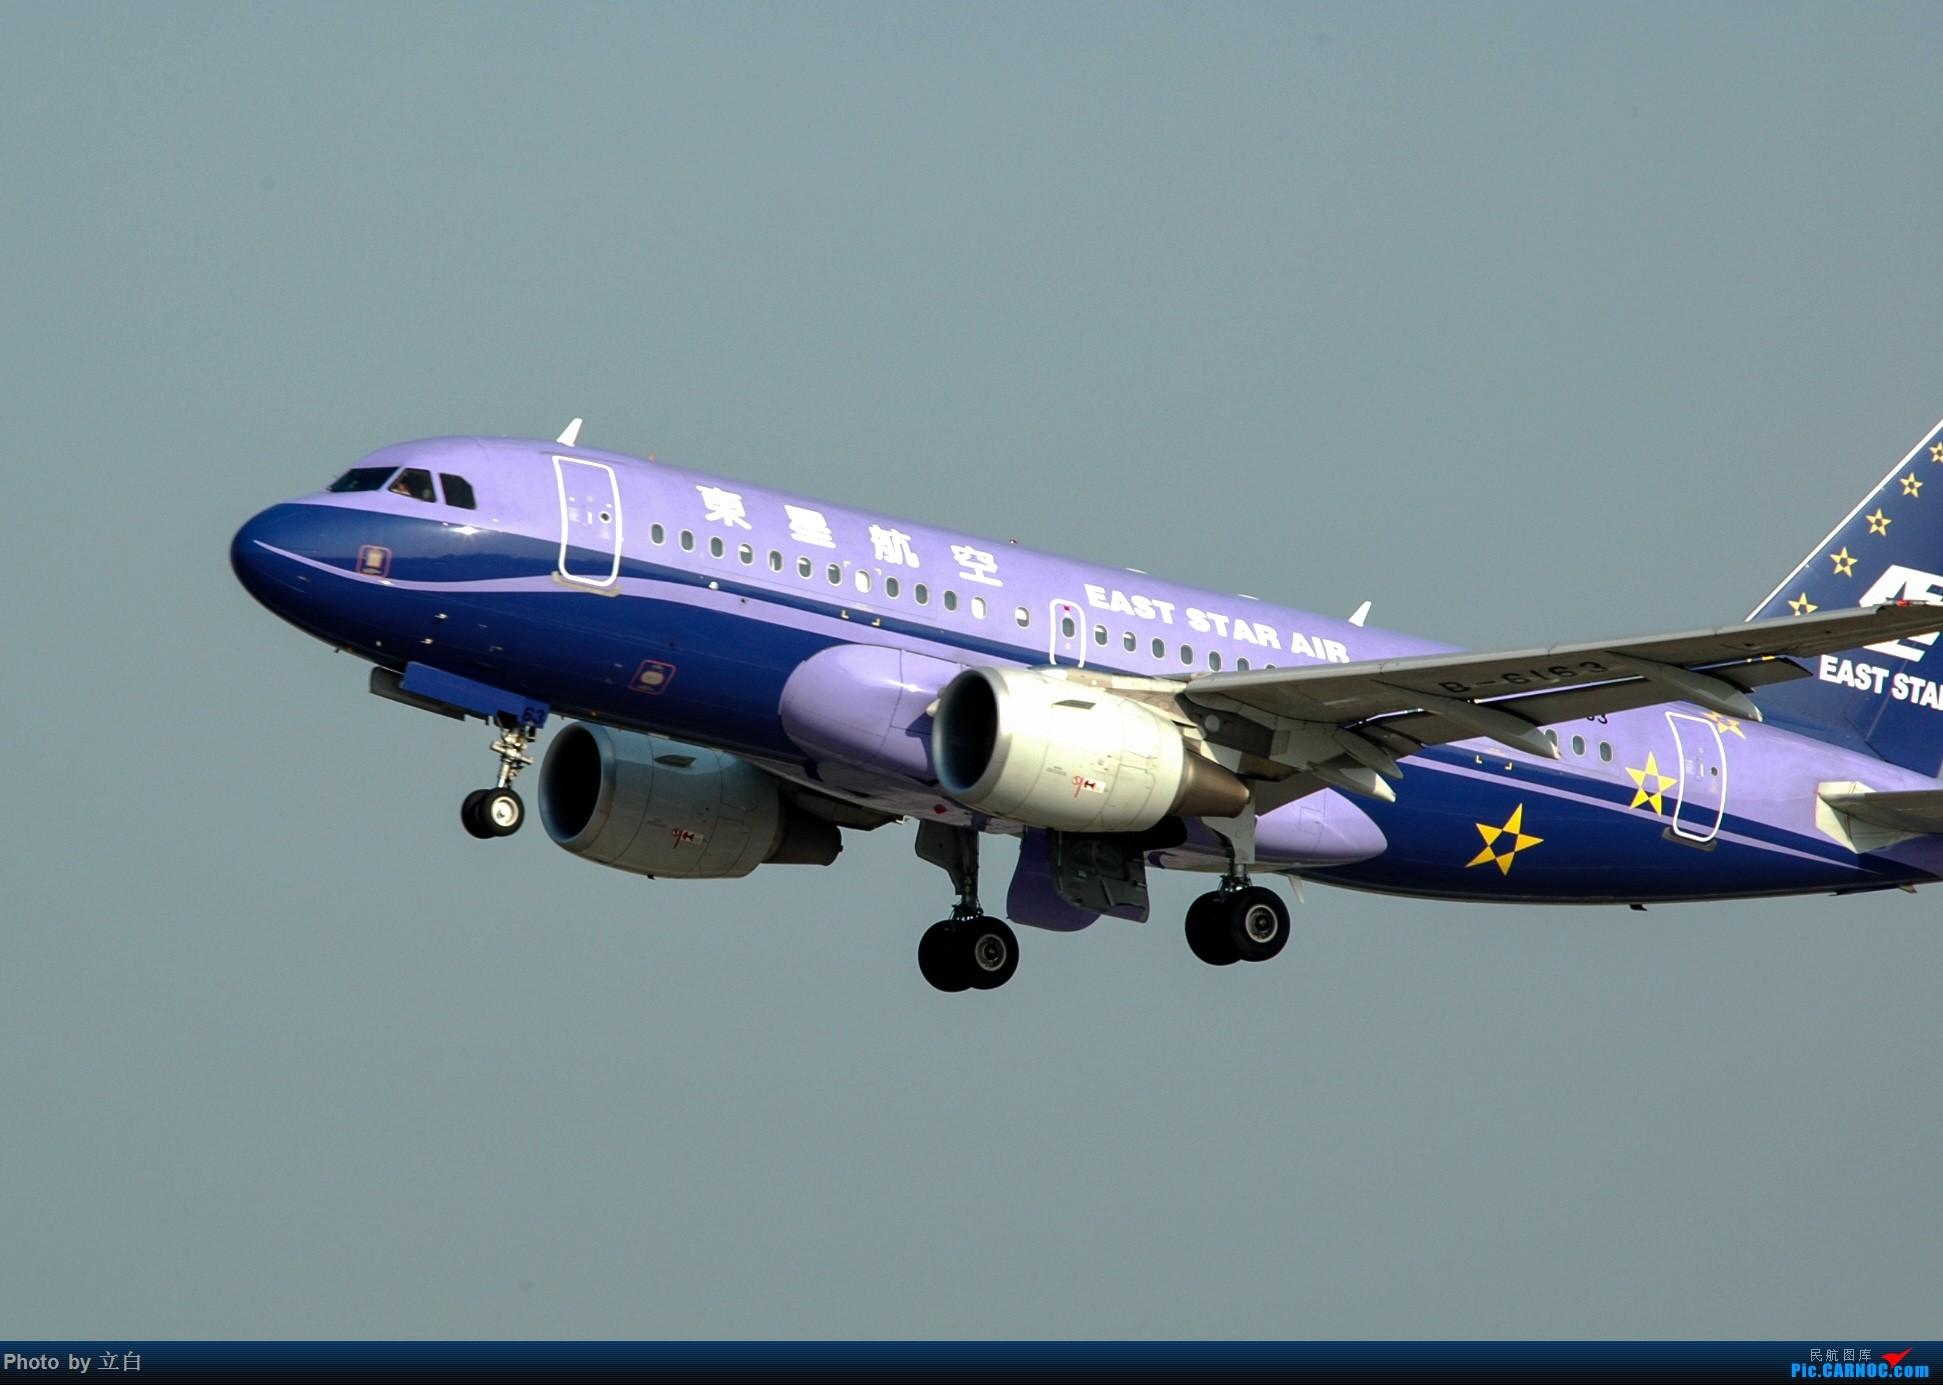 Re:[原创]以前拍的烂片,但也算是历史的记忆 AIRBUS A319-100 B-6163 中国广州白云国际机场